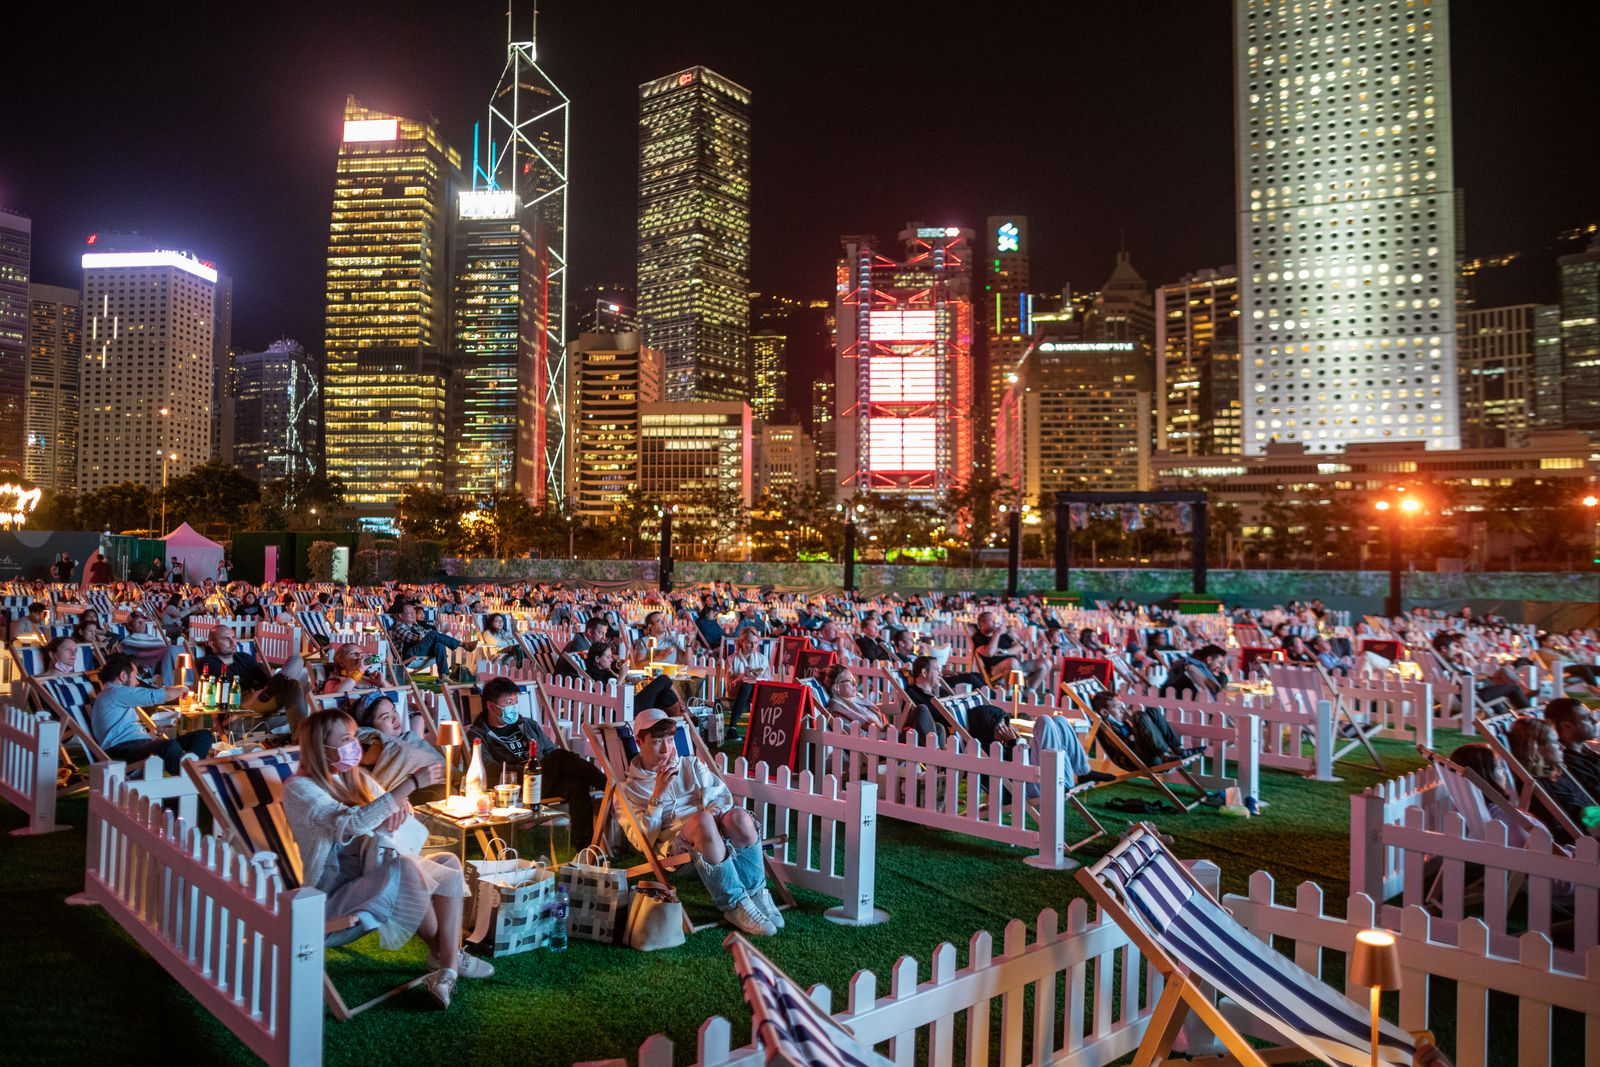 Outdoor social distancing cinema in Hong Kong